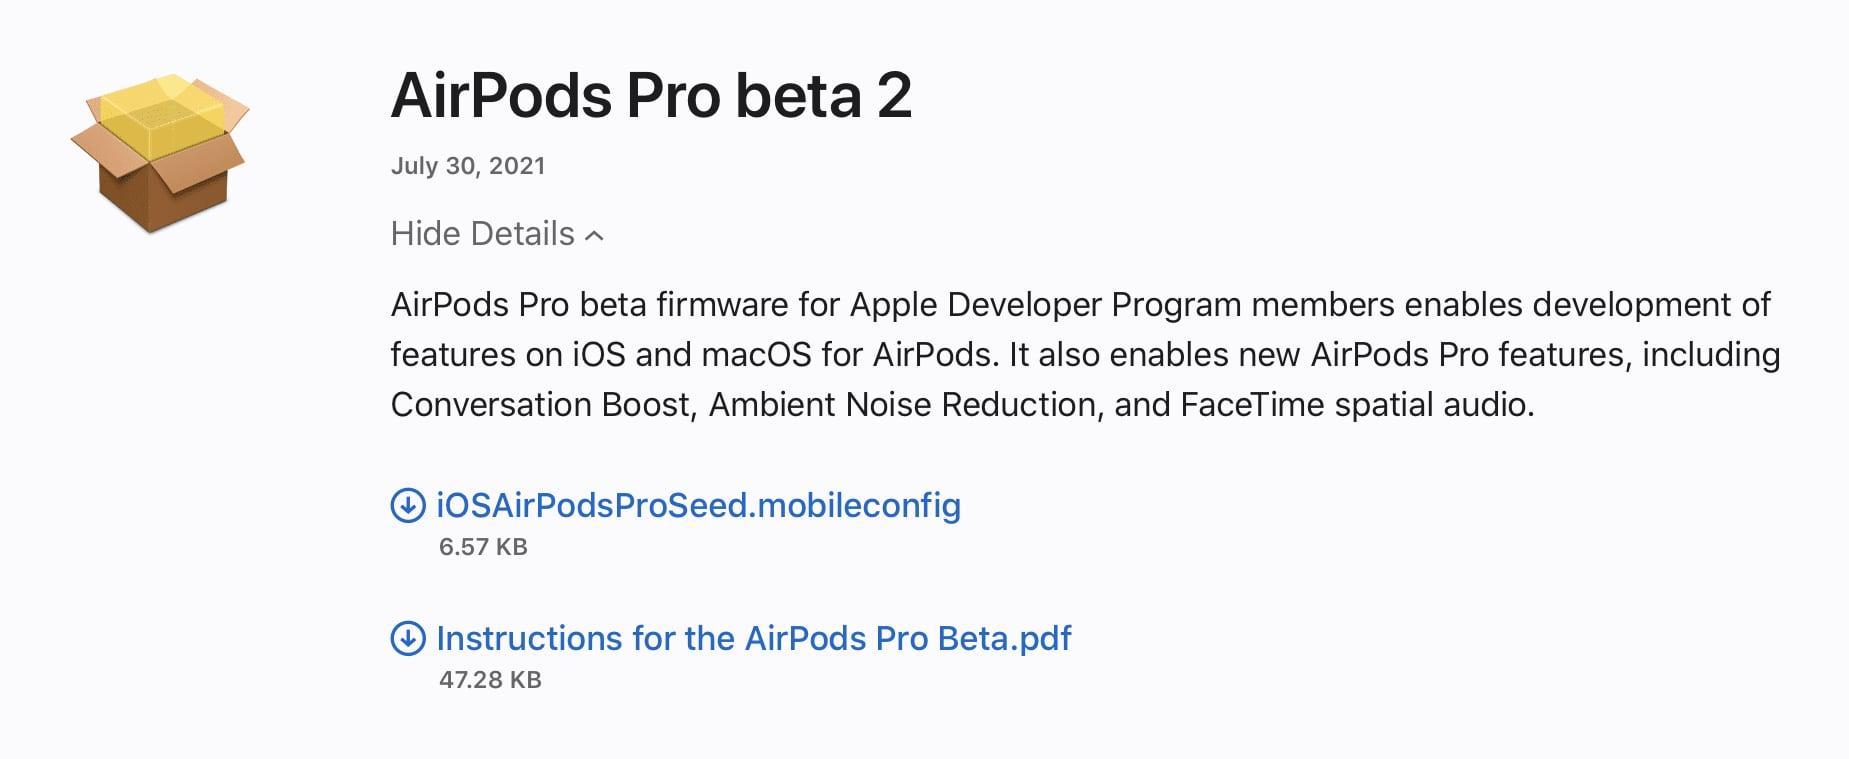 AirPods Pro beta 2